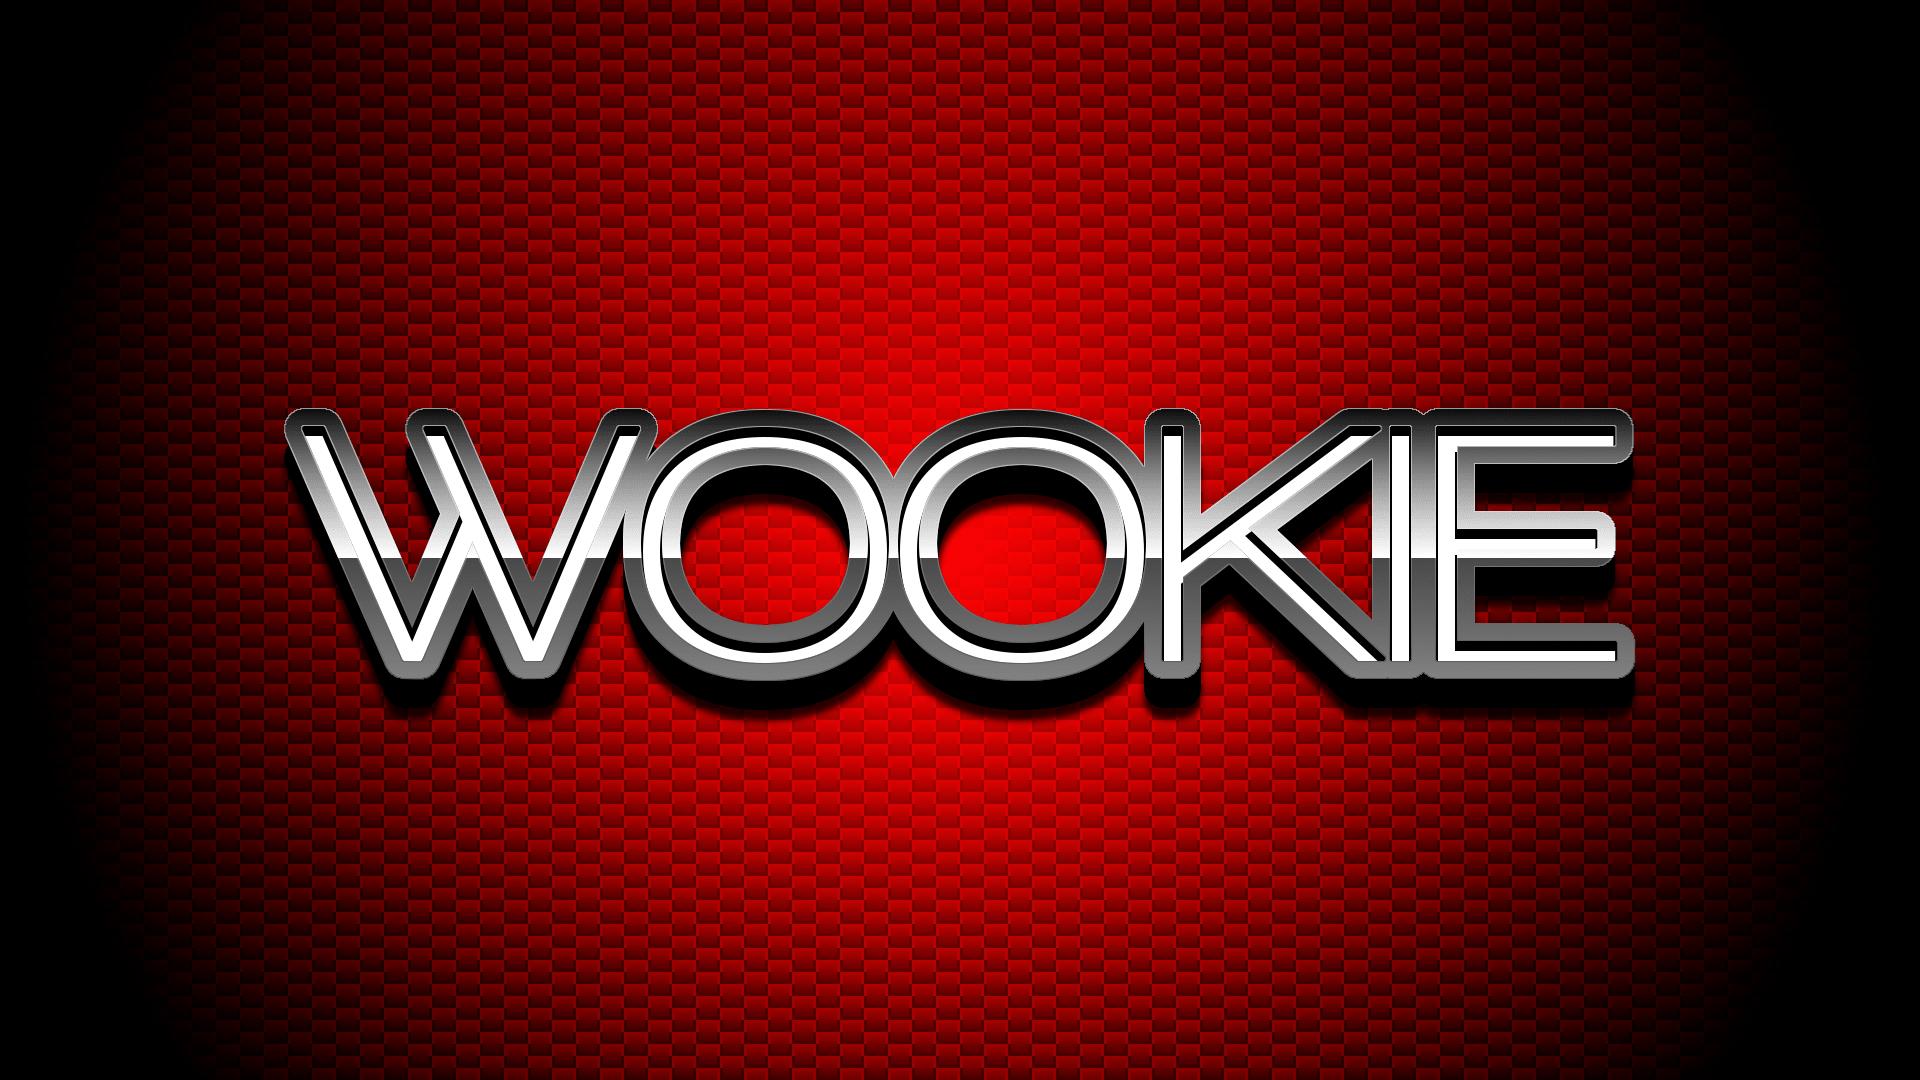 How To Install Kodi 17.1 Wookie Build